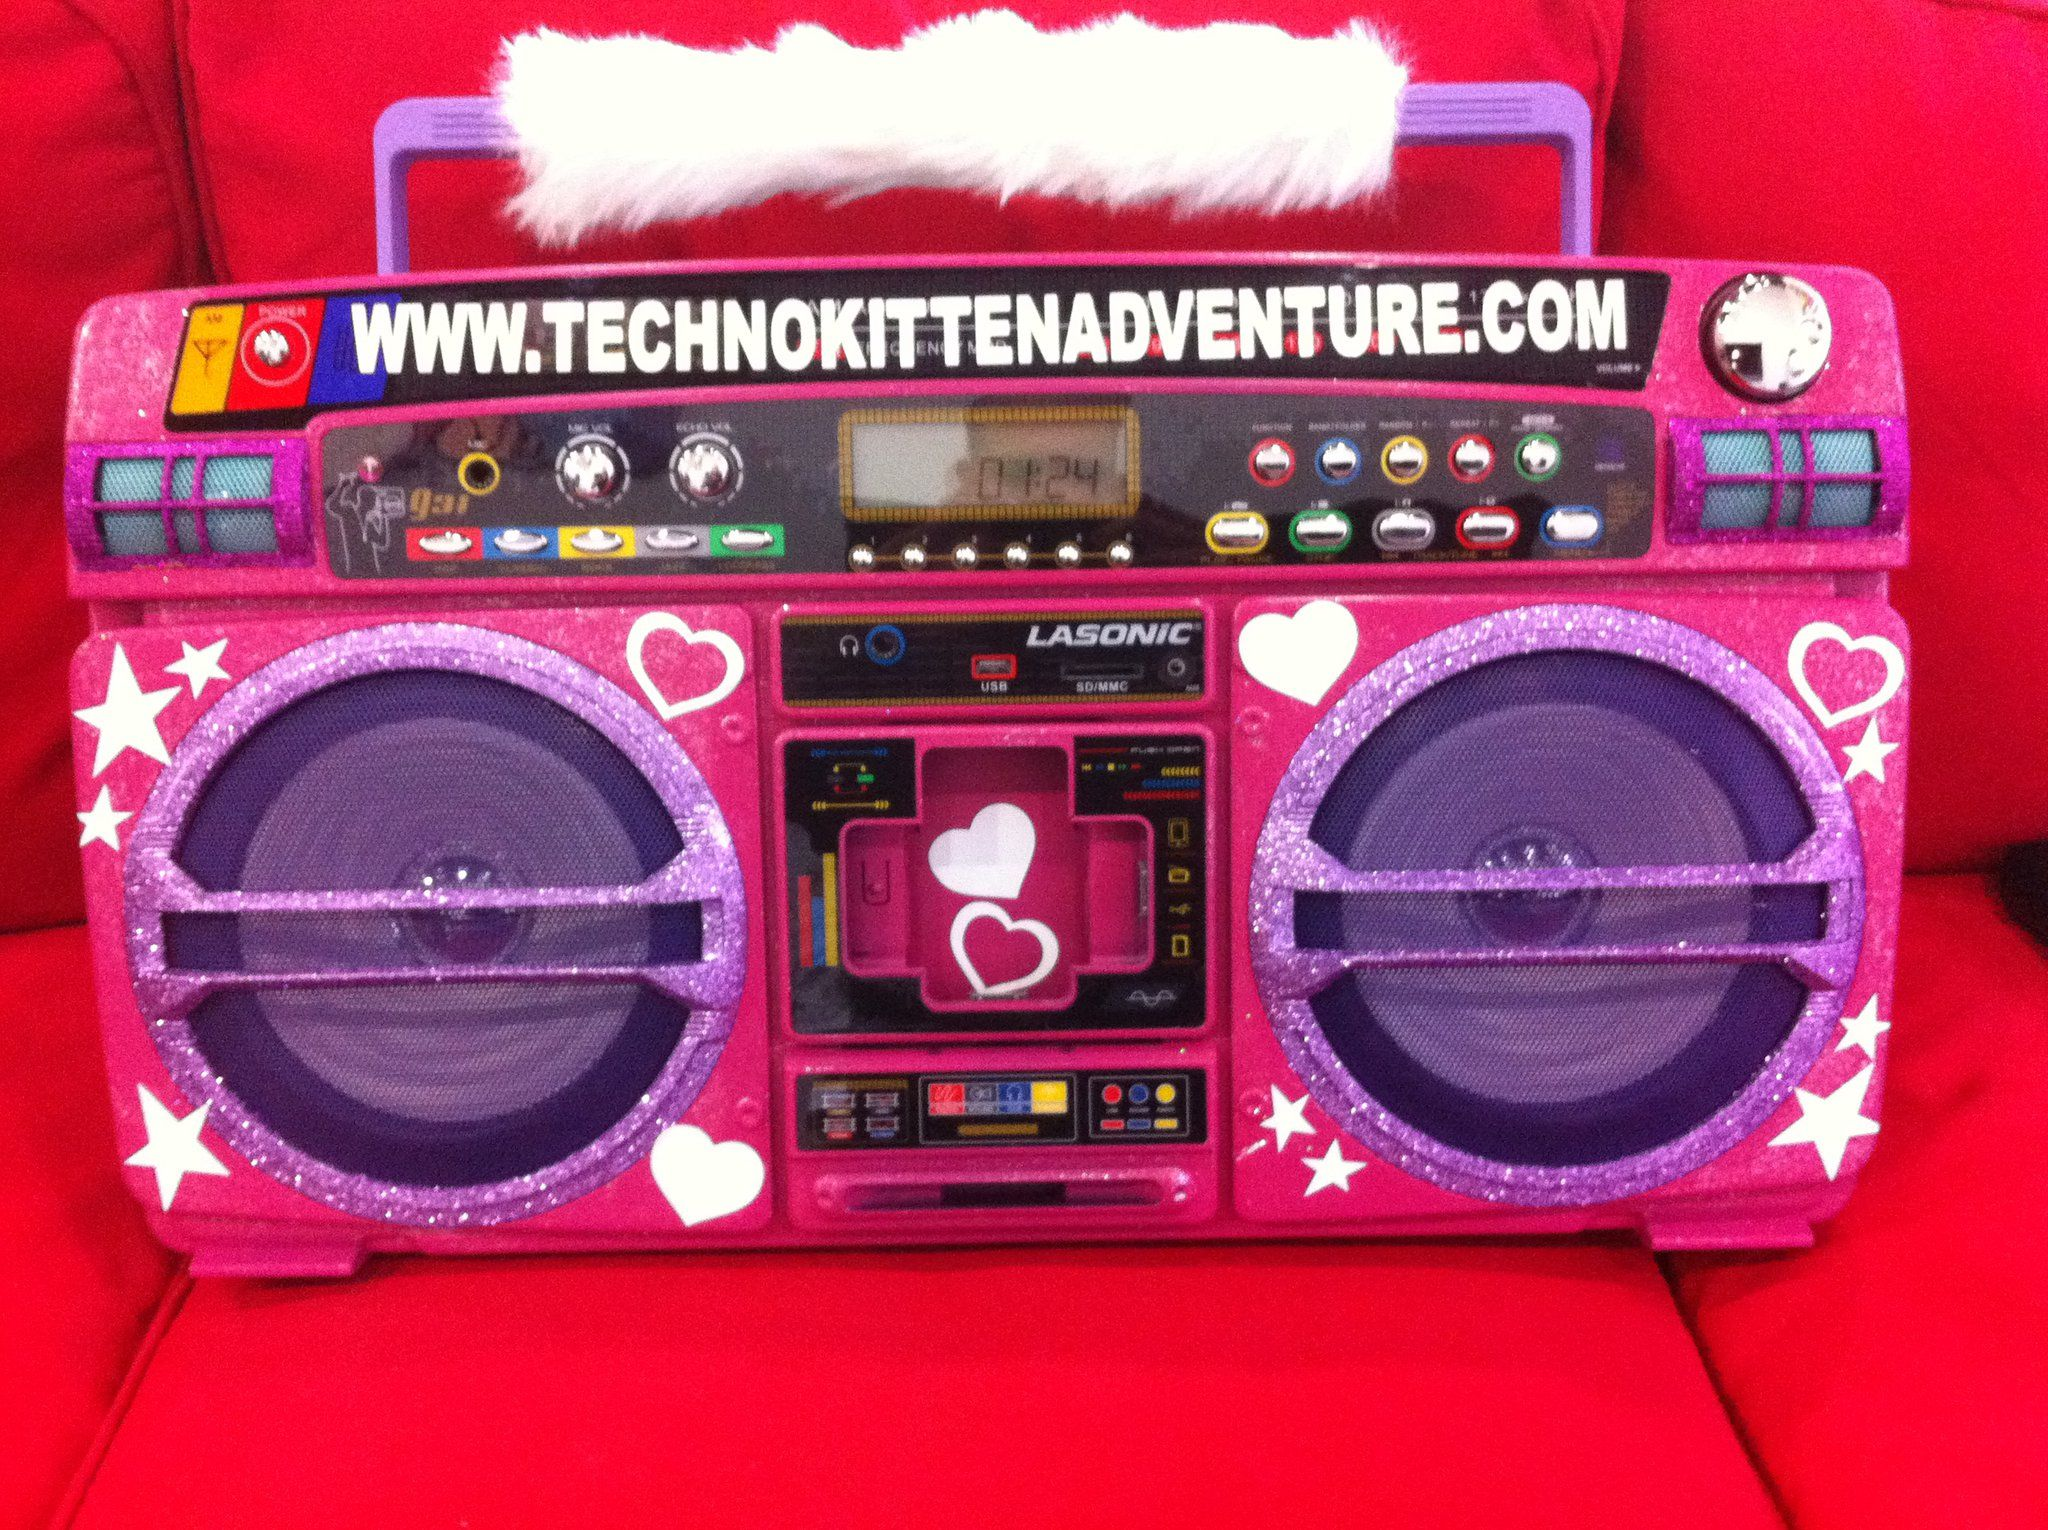 Tka Www Technokittenadventure Com Car Radio Kitten Techno